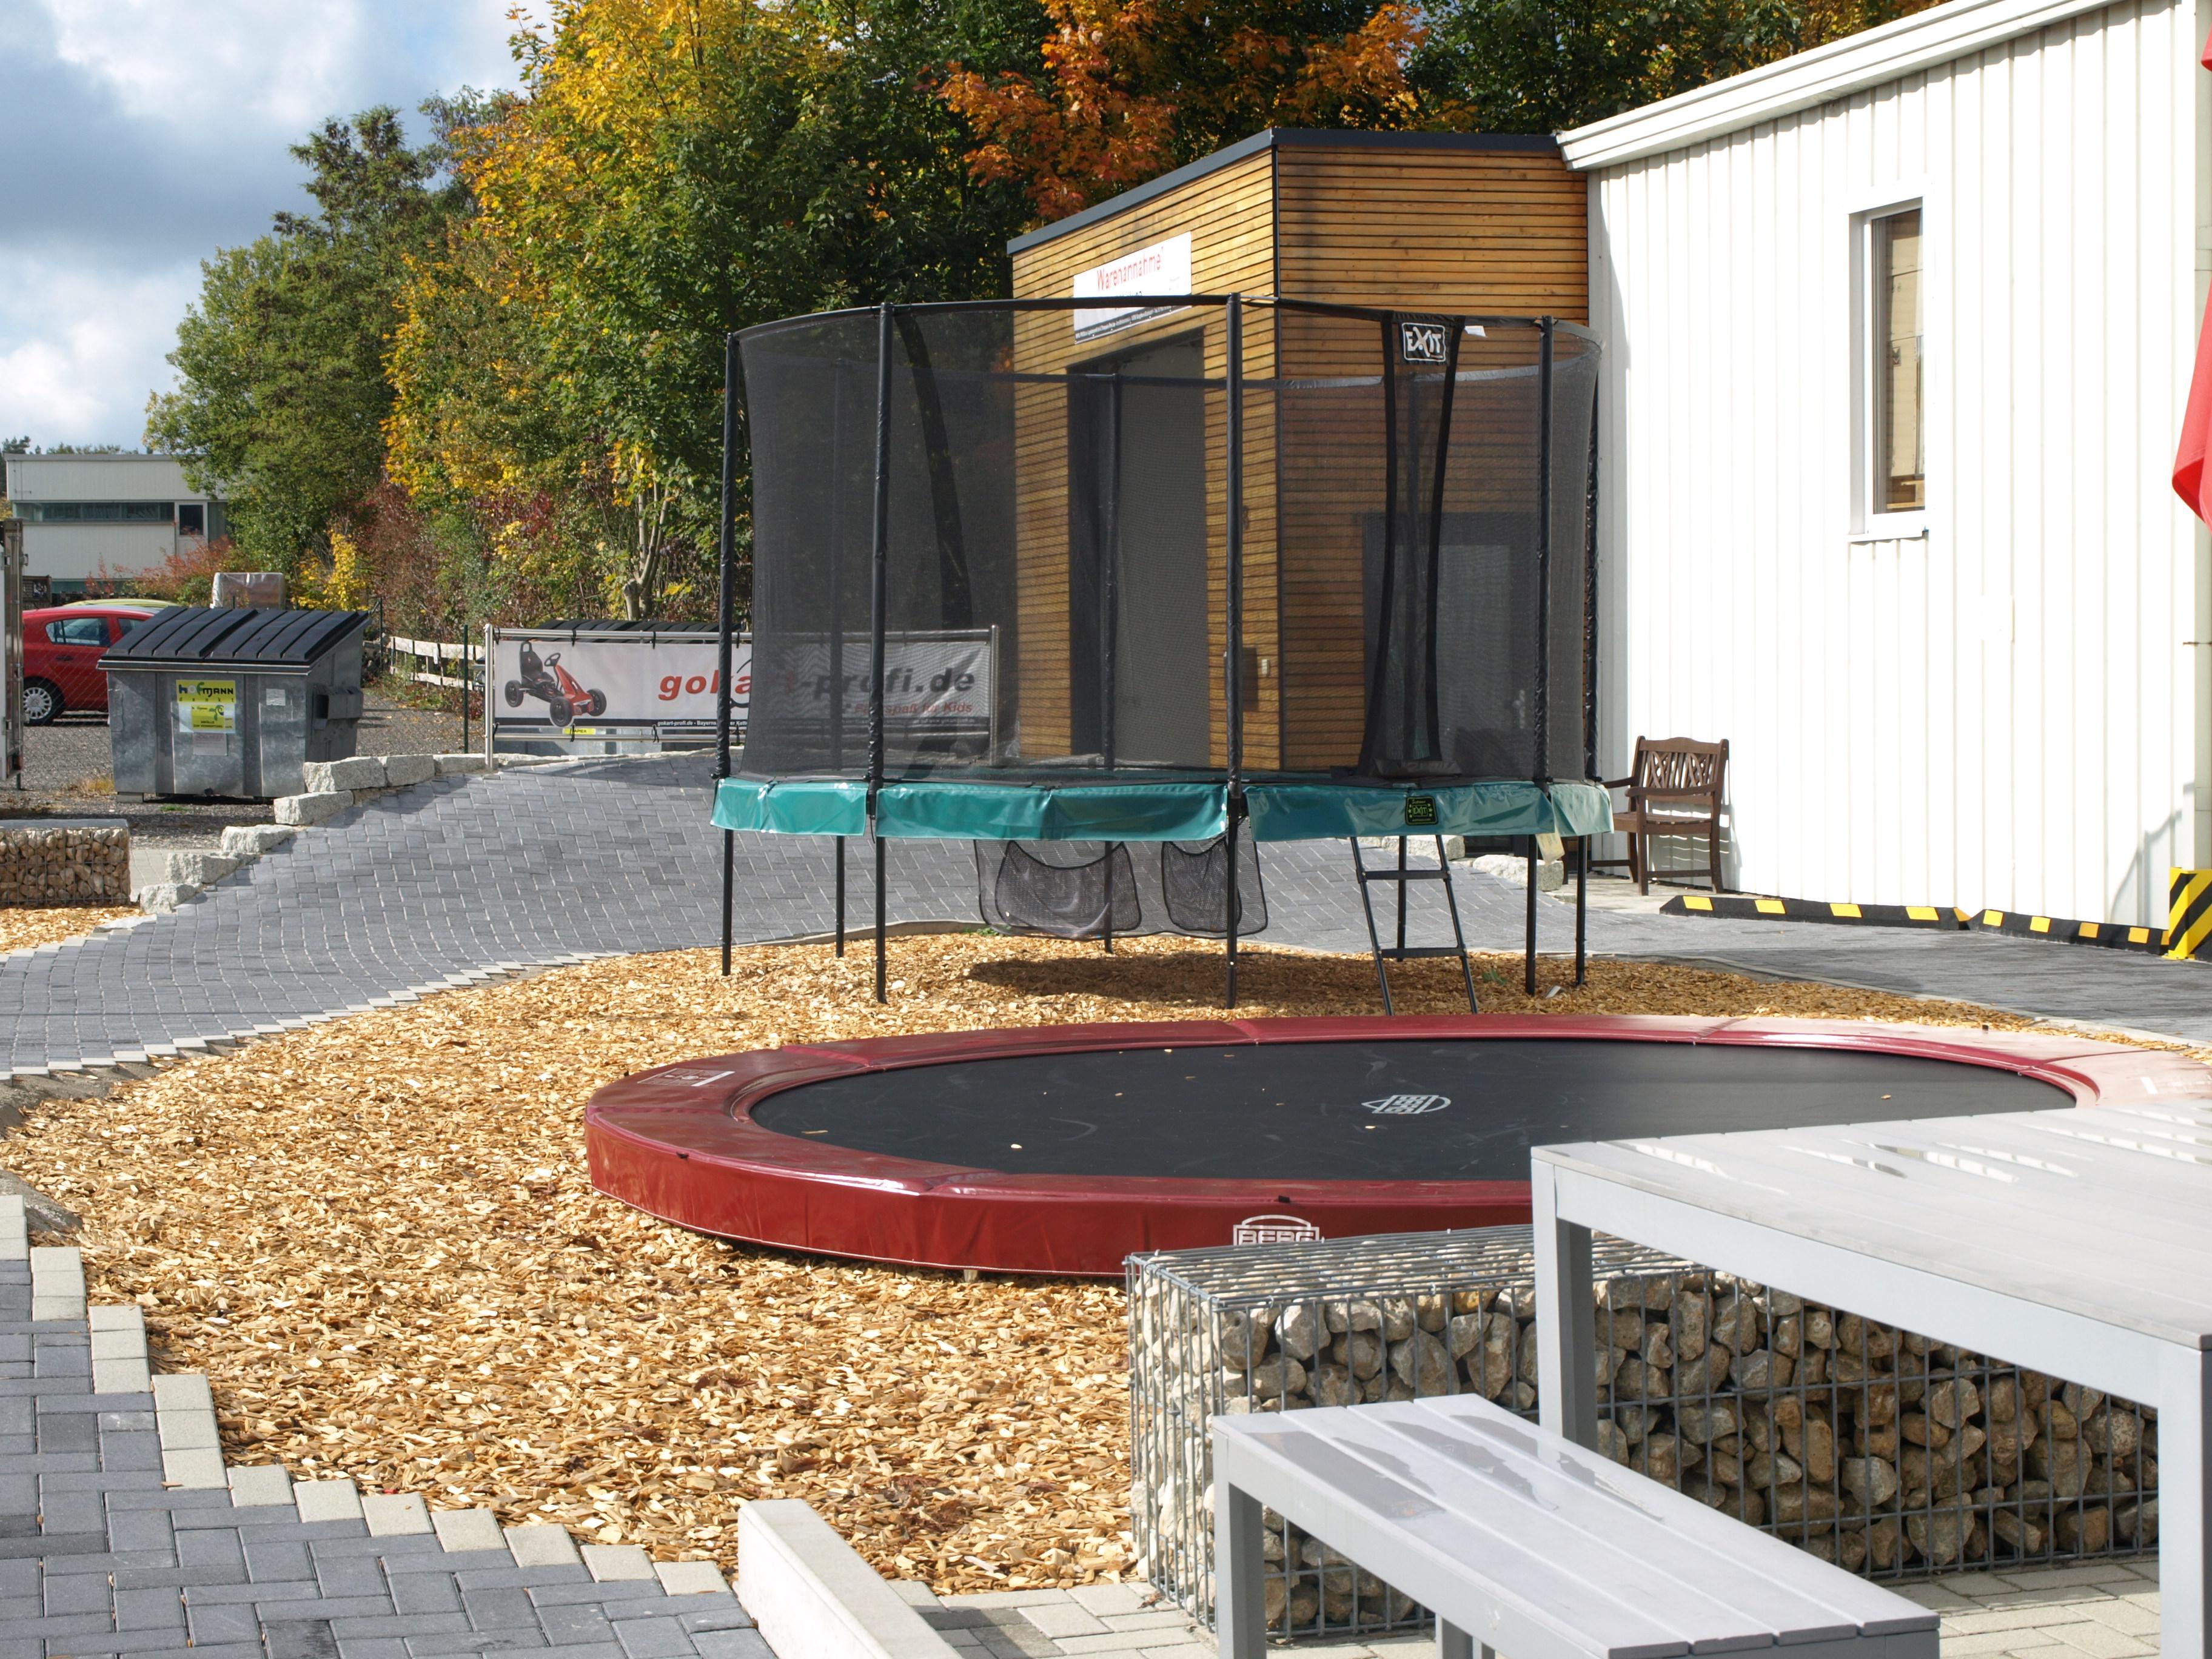 qualit ts gartentrampoline im abverkauf trampolin blog. Black Bedroom Furniture Sets. Home Design Ideas